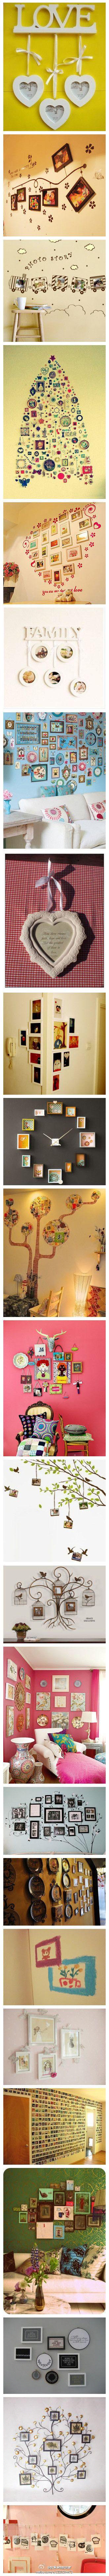 inspiring wall ideas